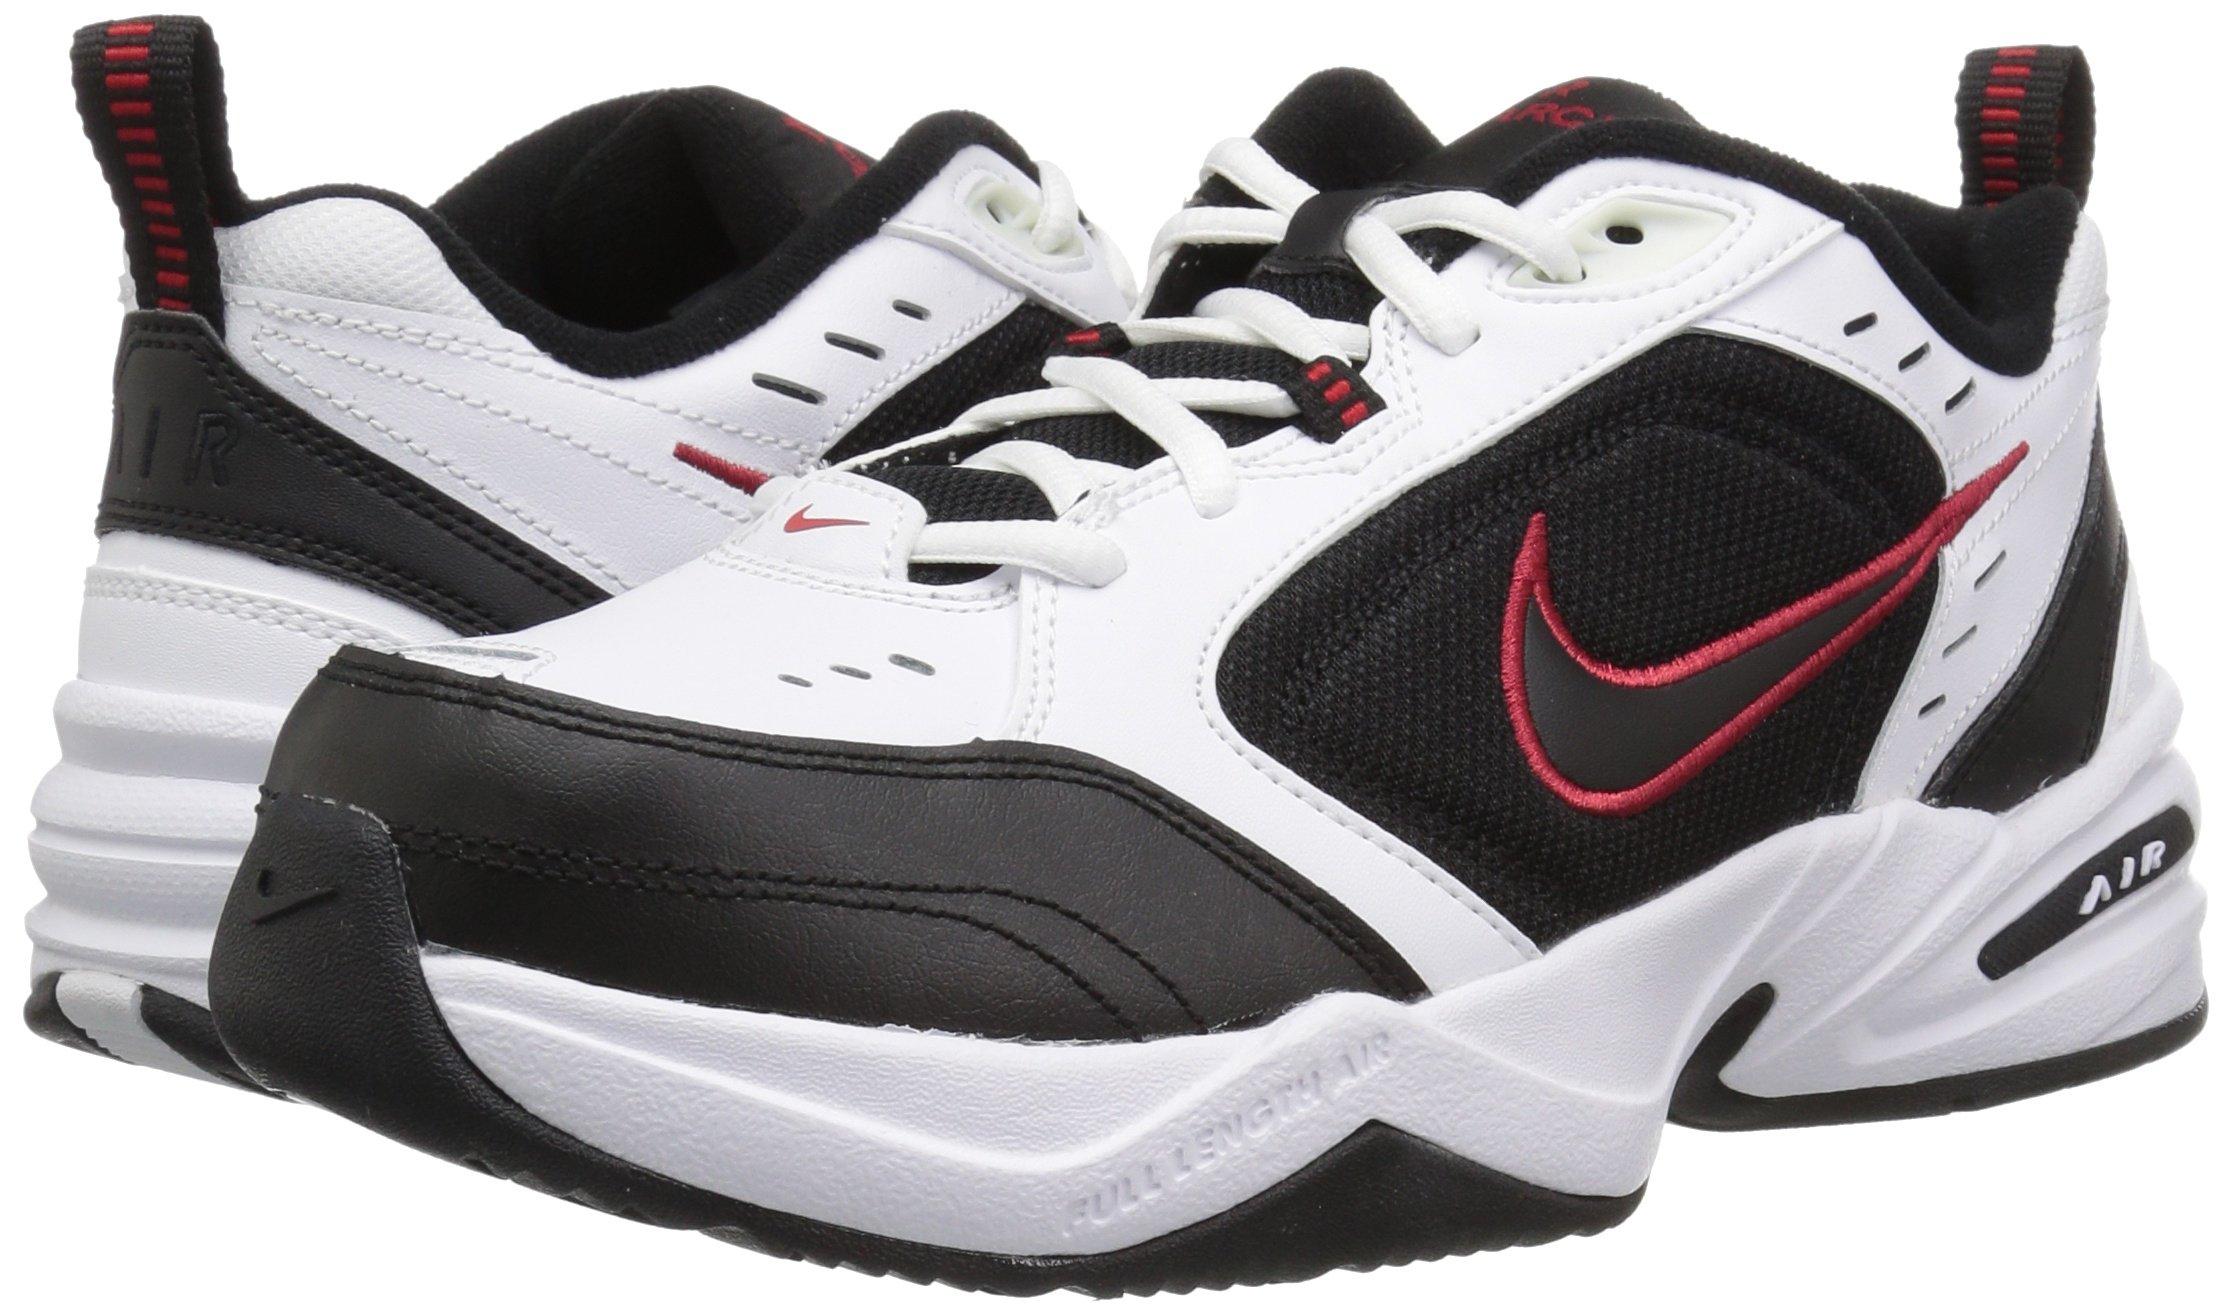 Nike Men's Air Monarch IV Cross Trainer, White/Black, 7.0 Regular US by Nike (Image #5)